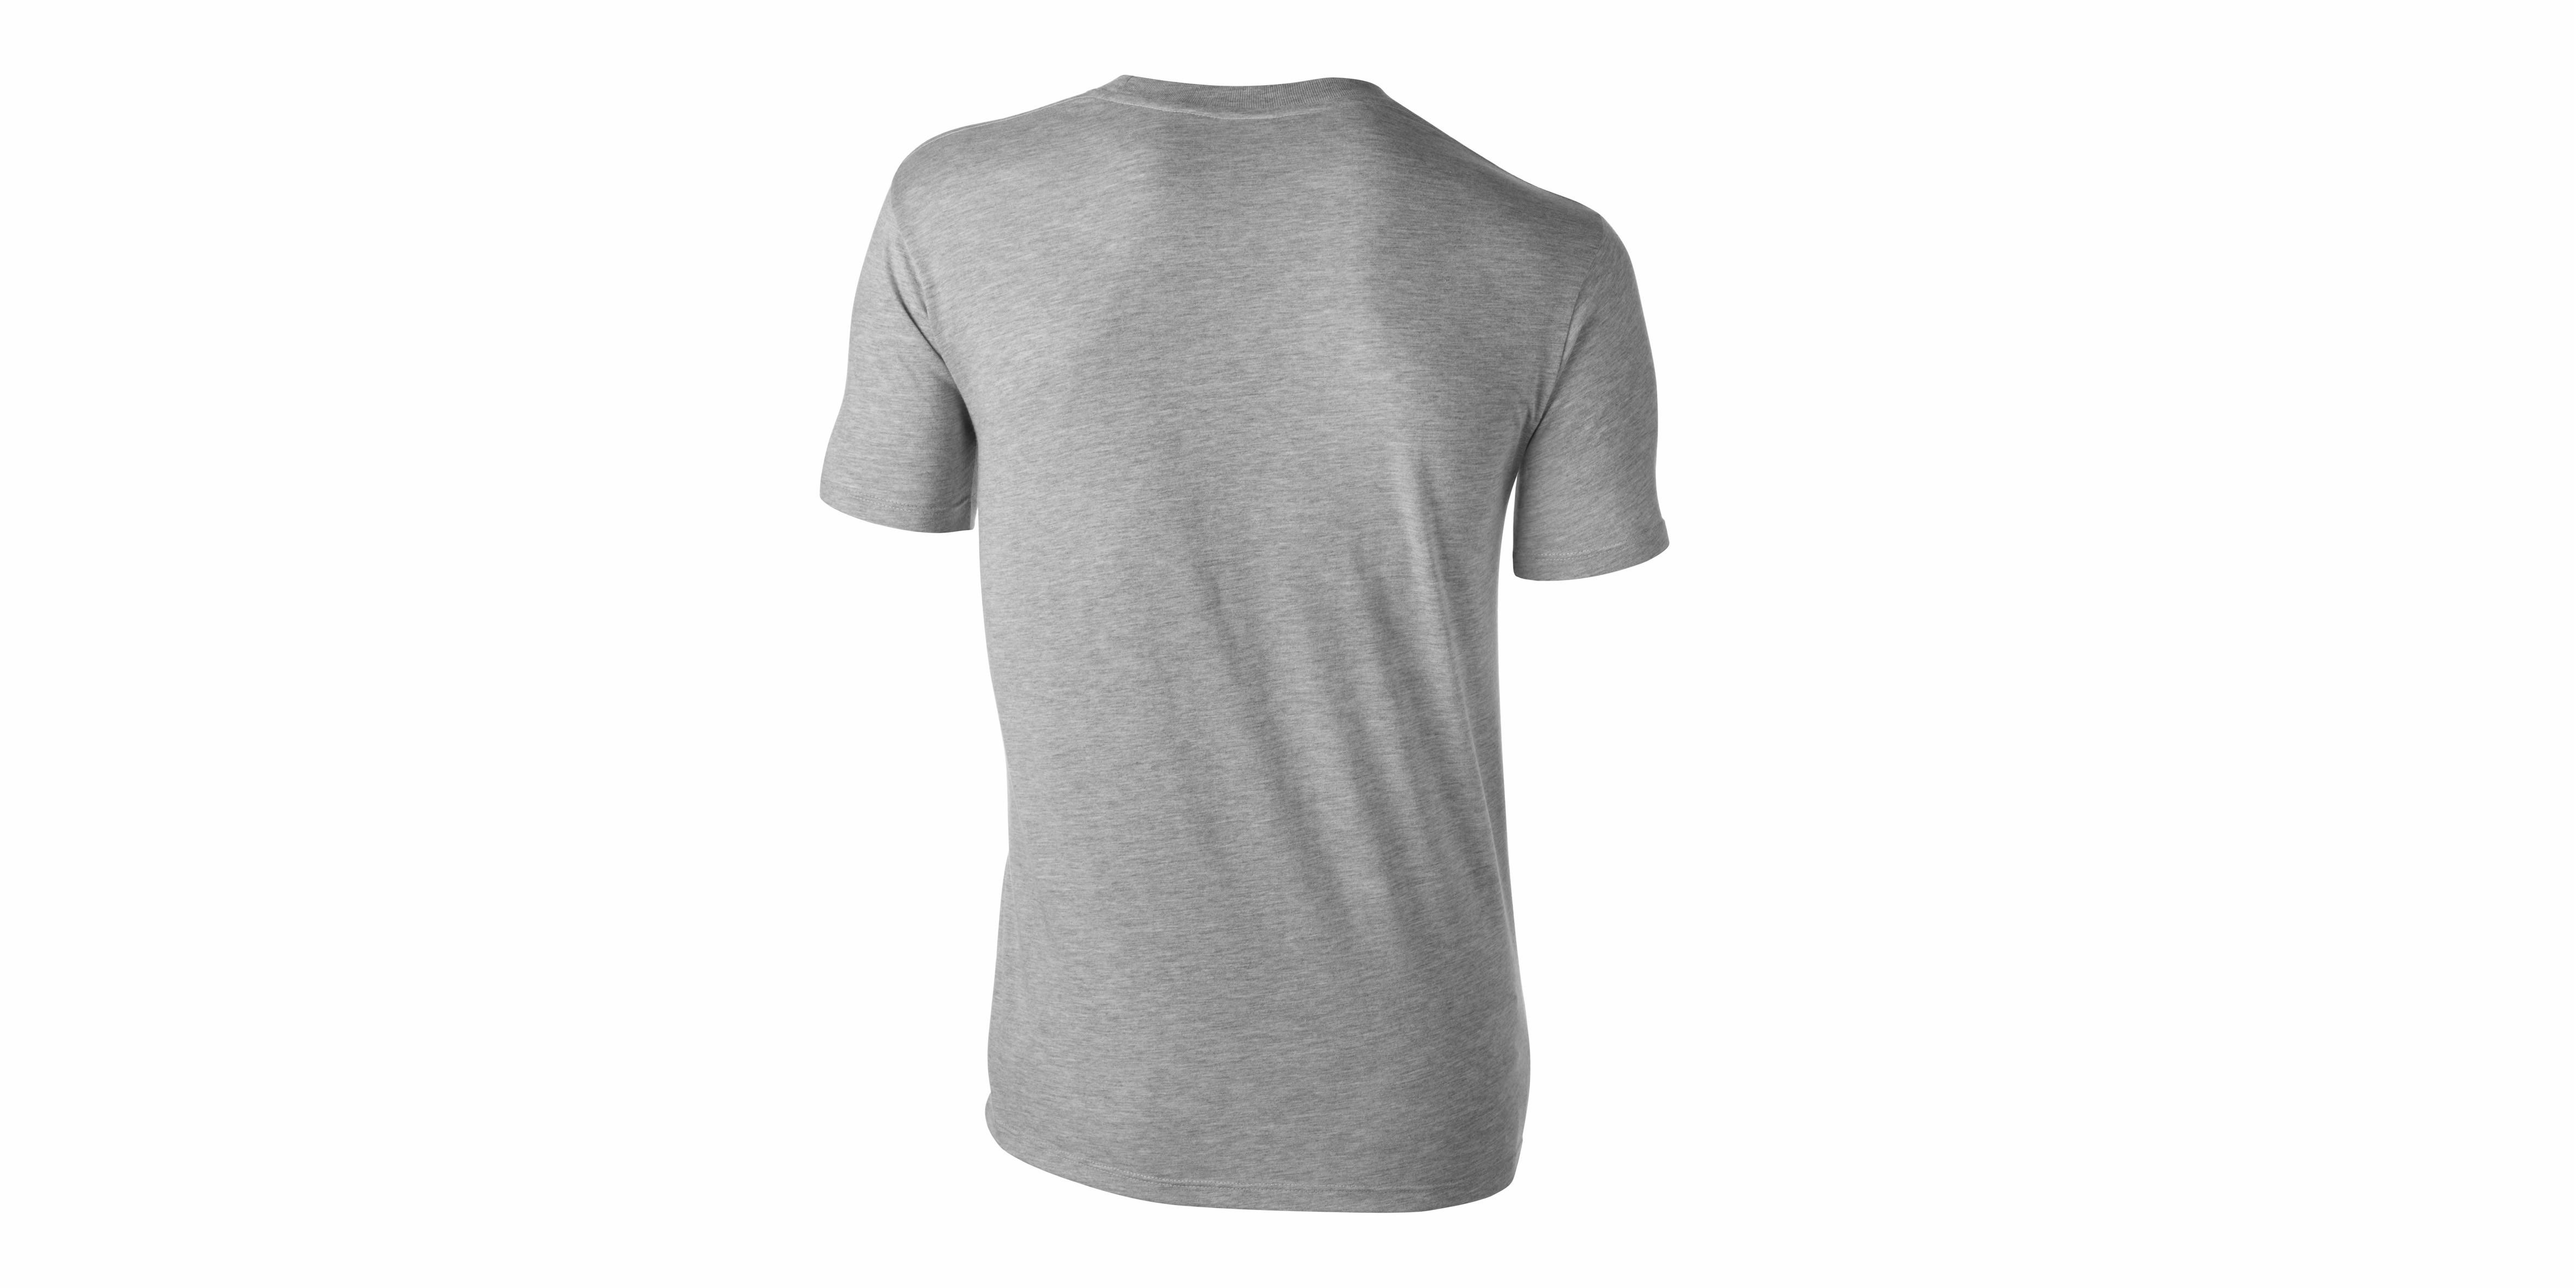 T-Shirt TRX Schwarz auf Grau Männer Small